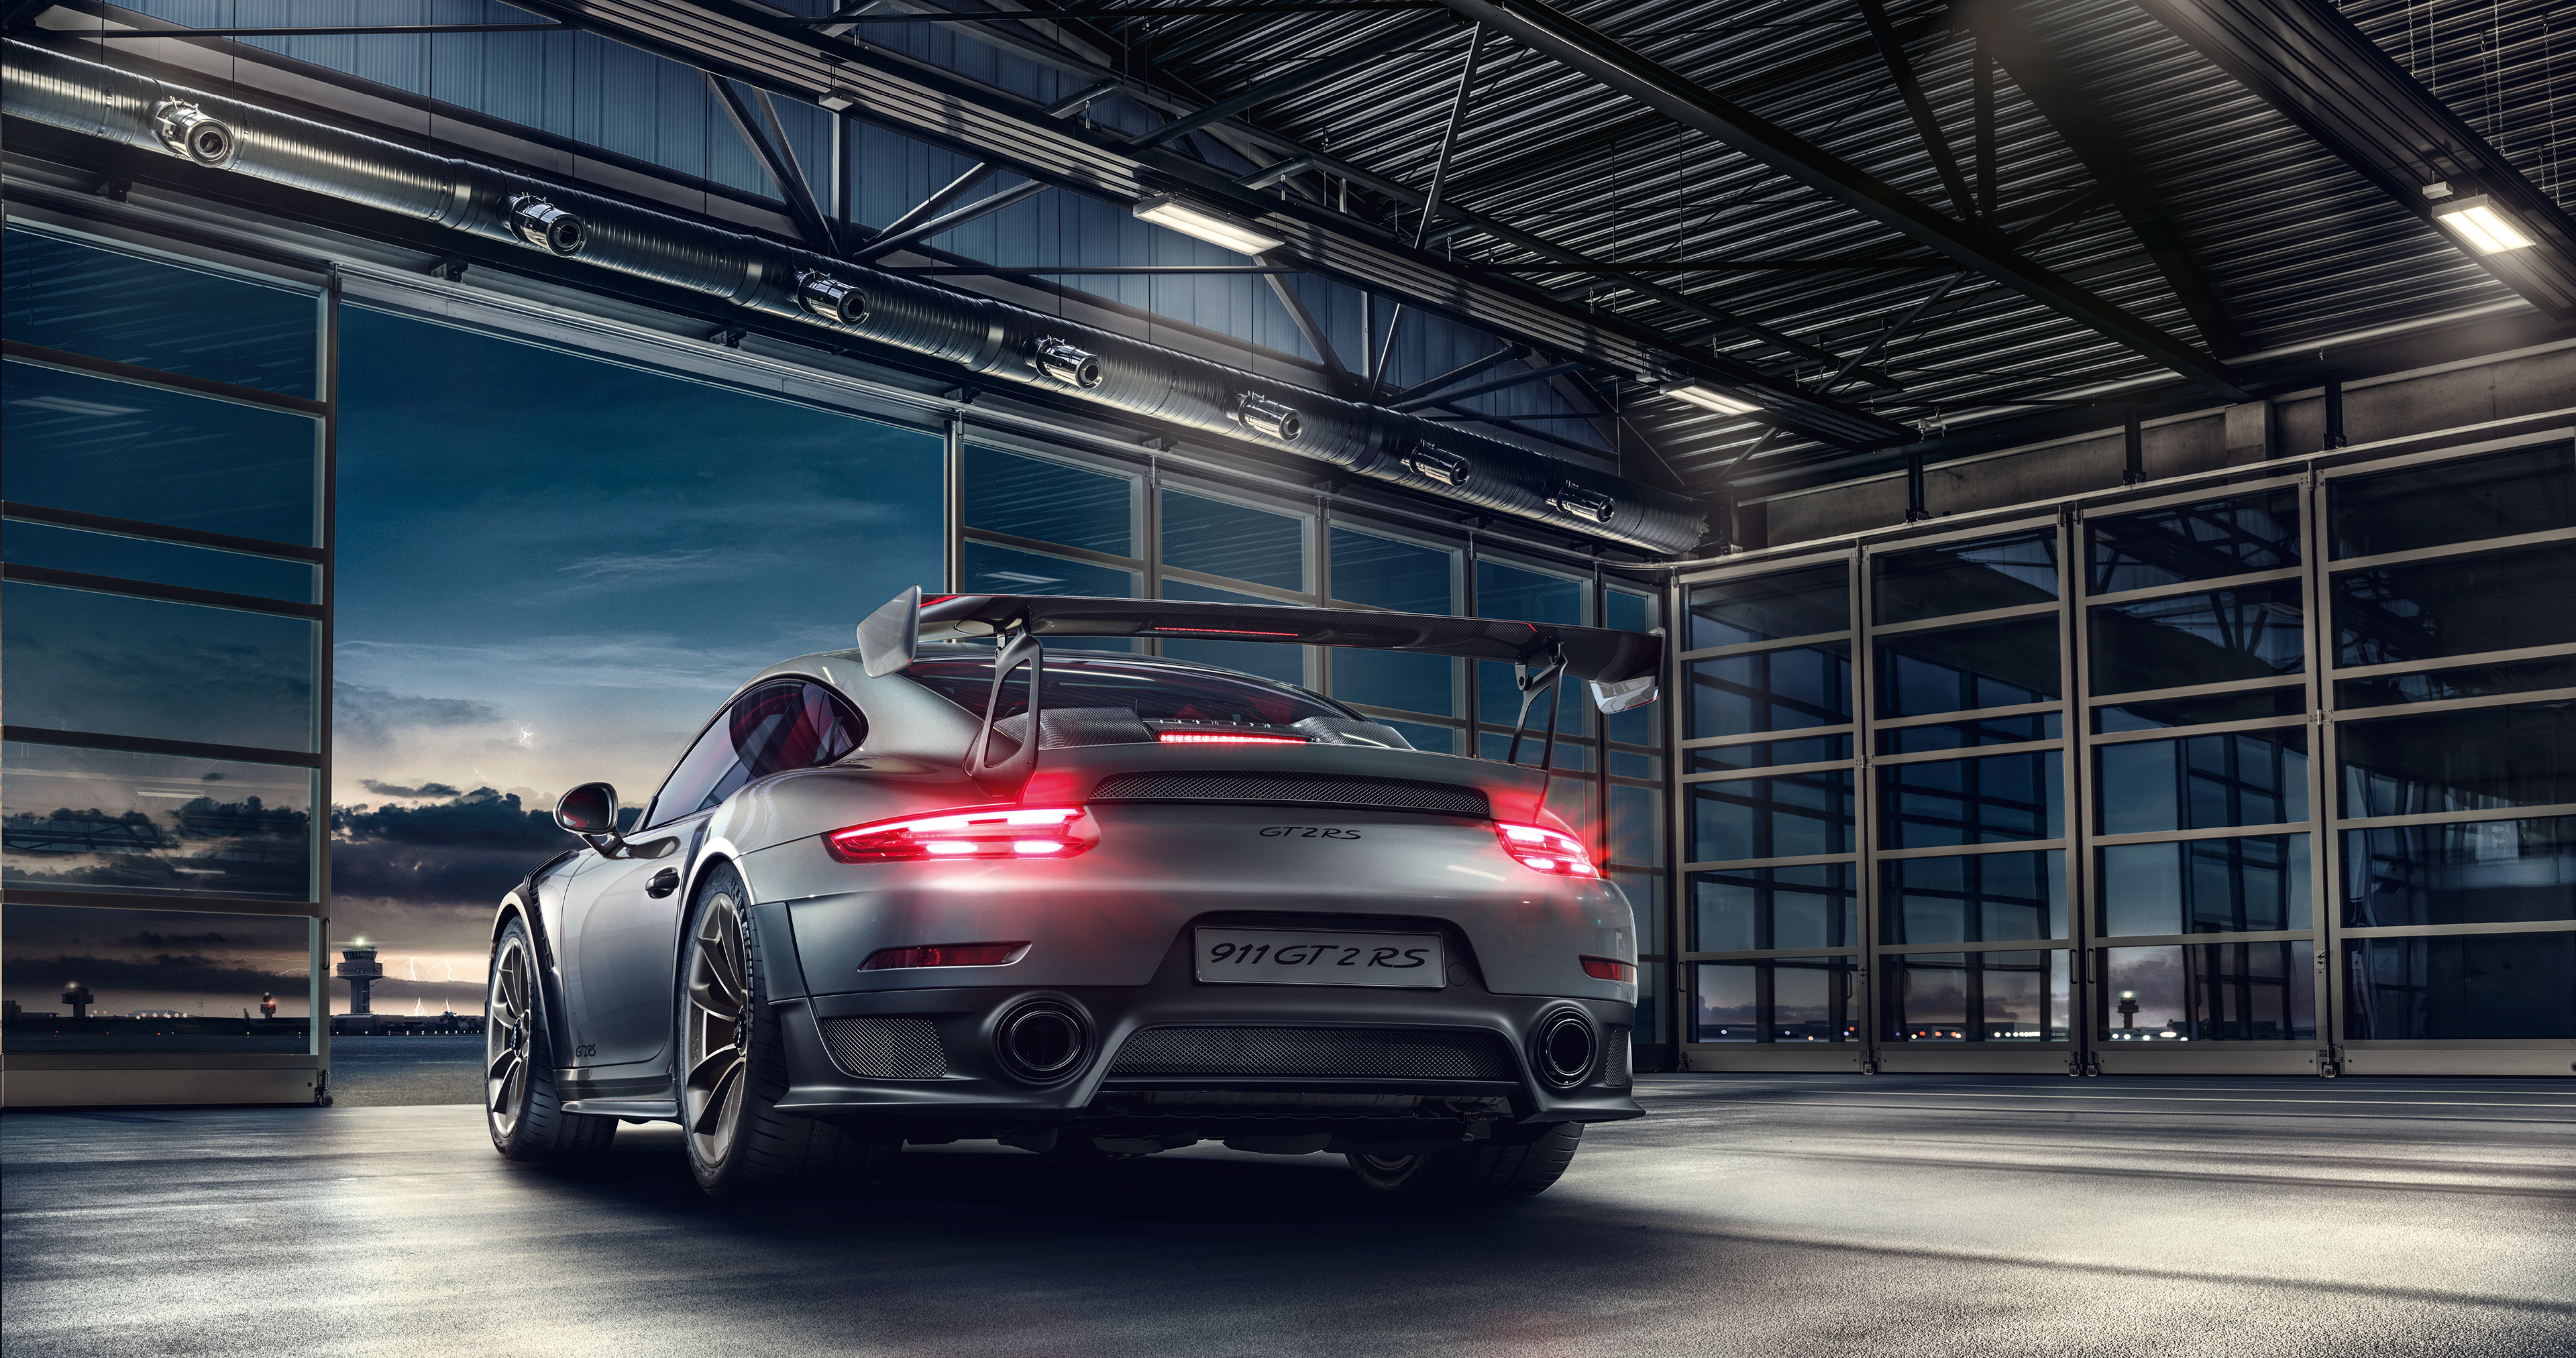 2019 Porsche 911 Gt2 Rs 4k Rear Hd Cars 4k Wallpapers